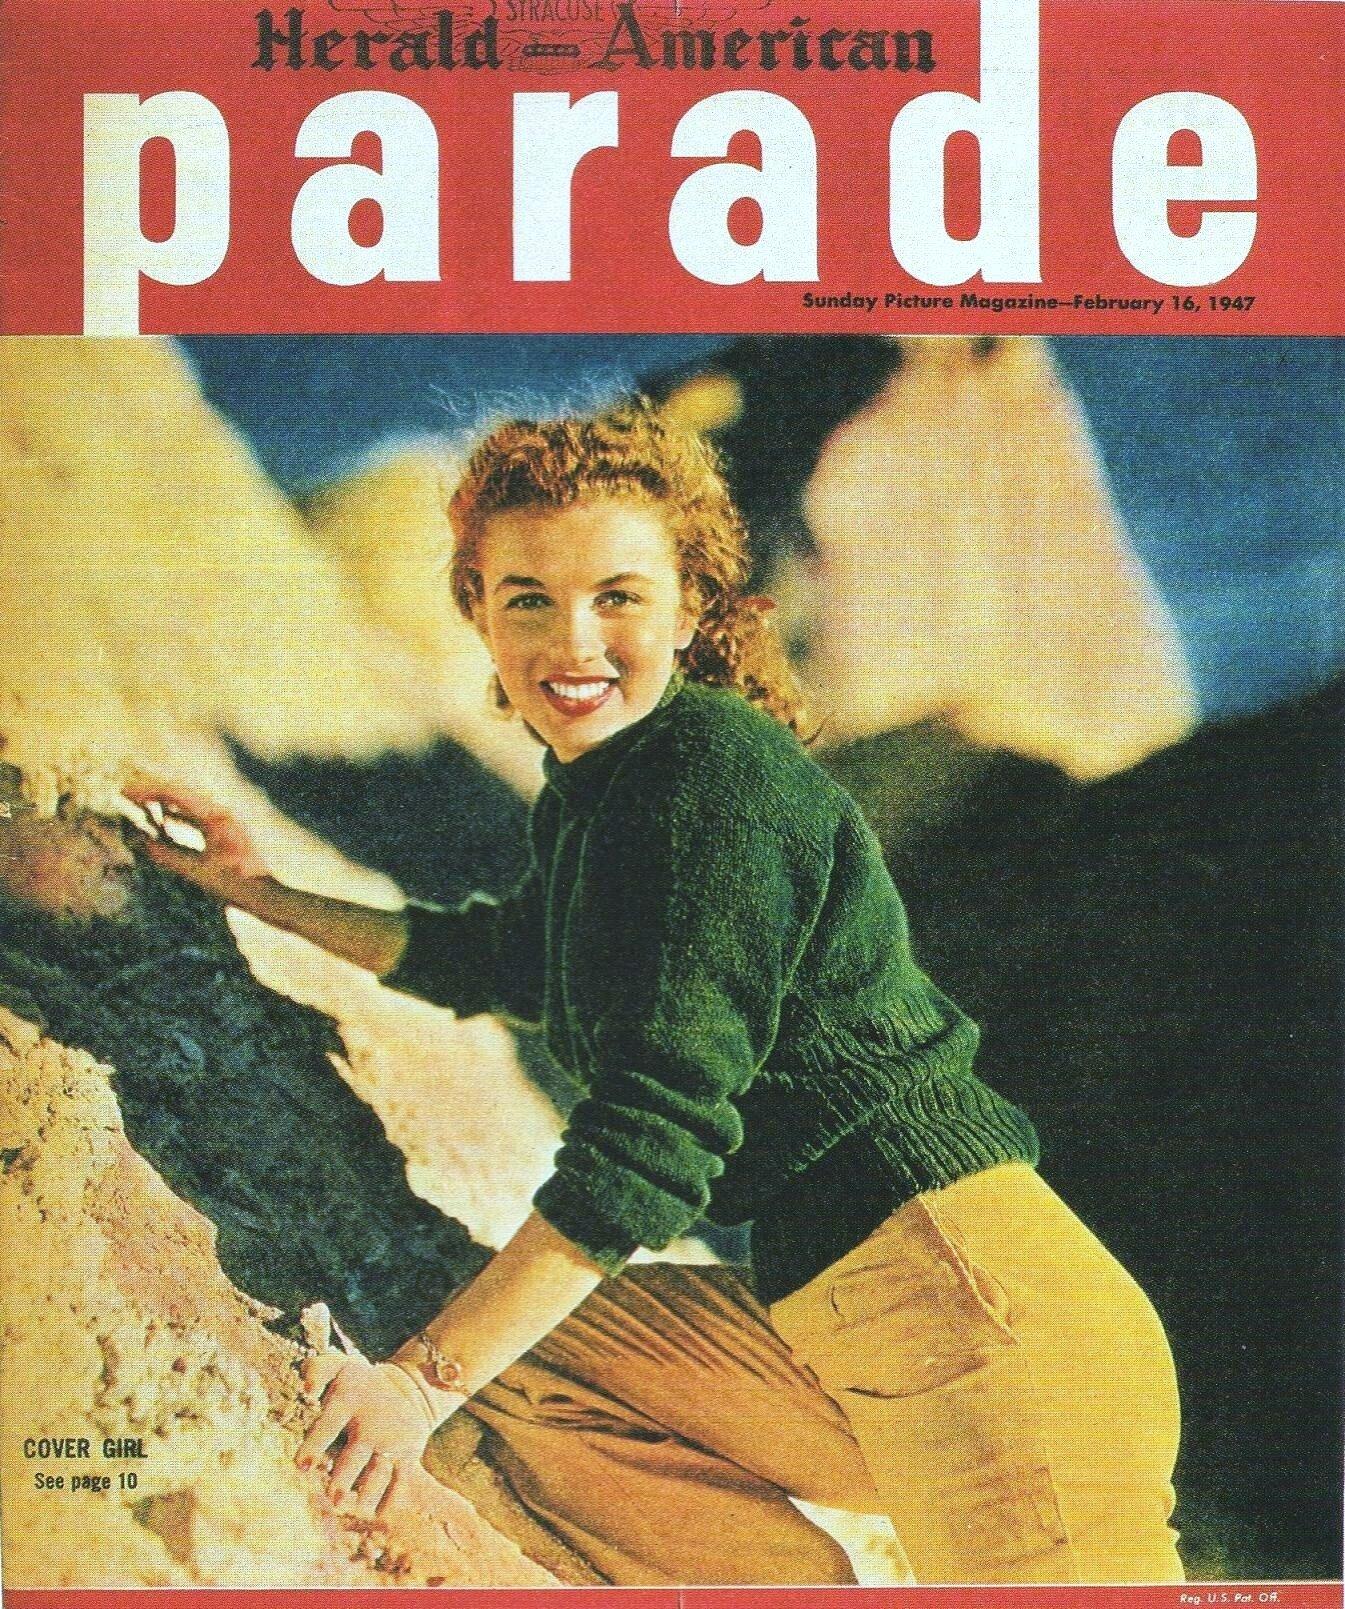 1947-02-16-parade_herald_american-usa